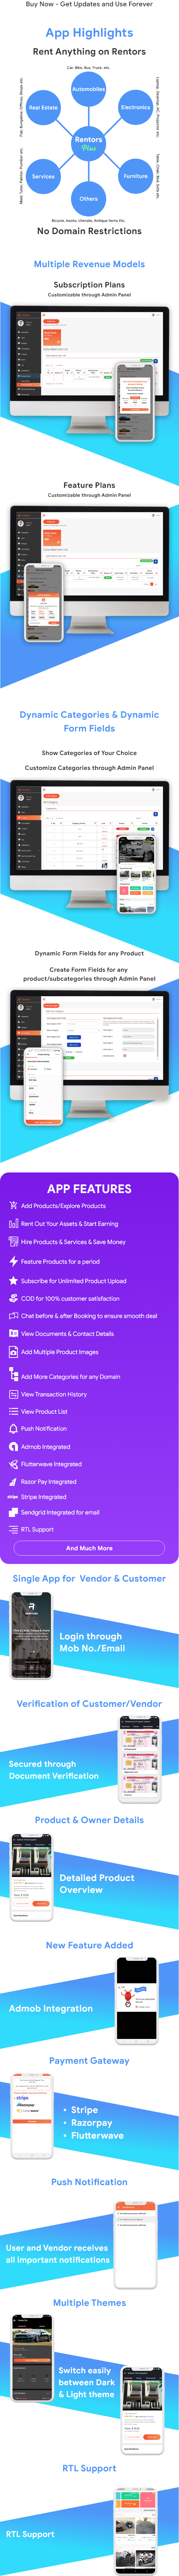 Rentors Plus- Universal Flutter App For Renting and Hiring - 4